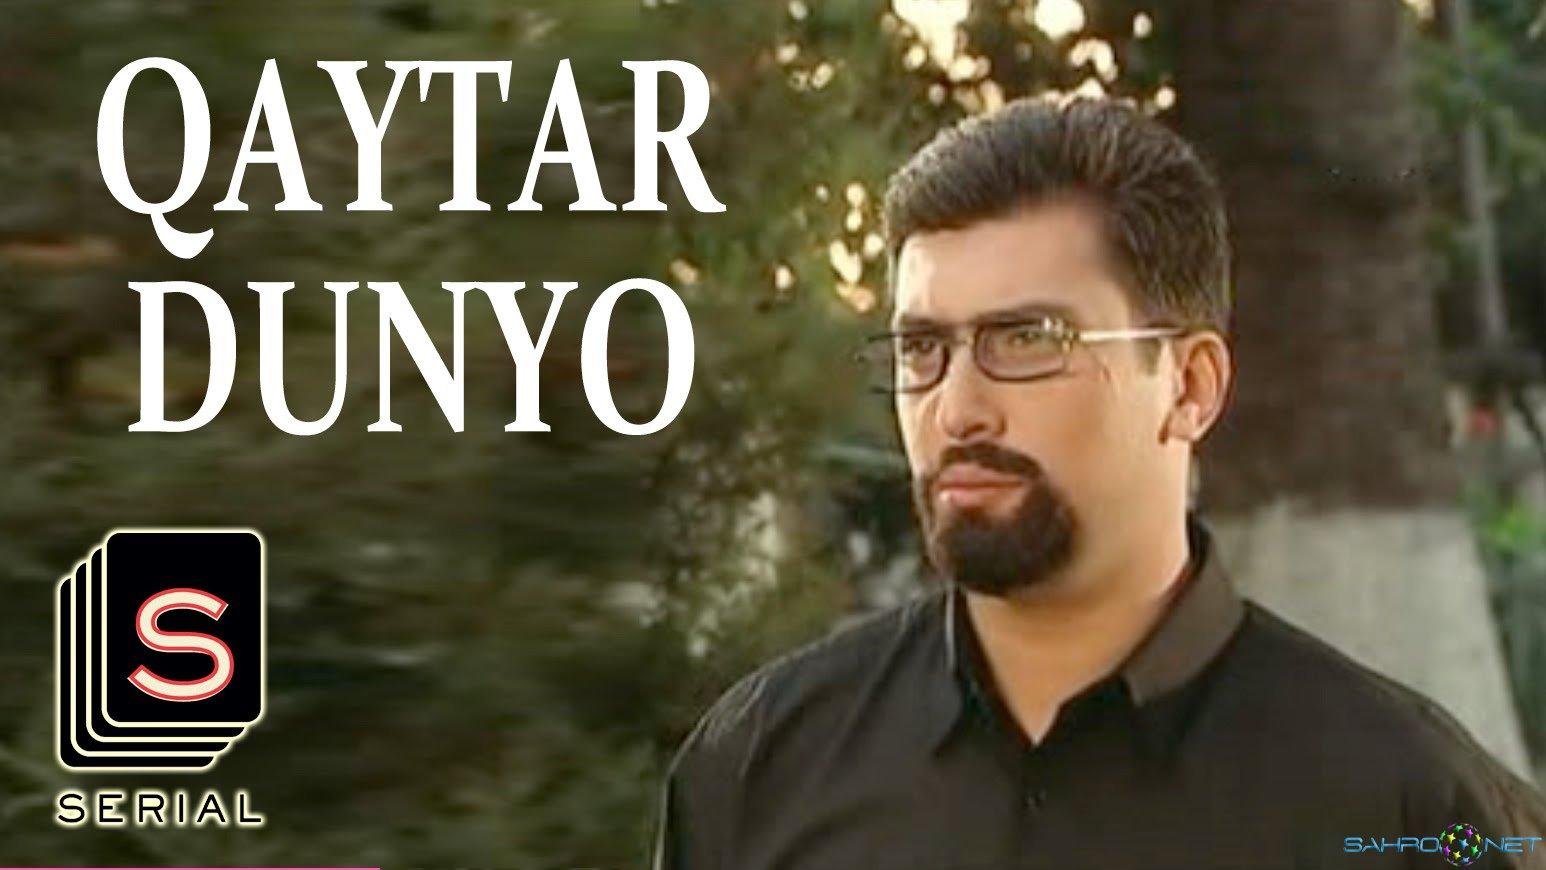 Сериал Qaytar dunyo / Кайтар Дунё Yangi Milliy Seril Online